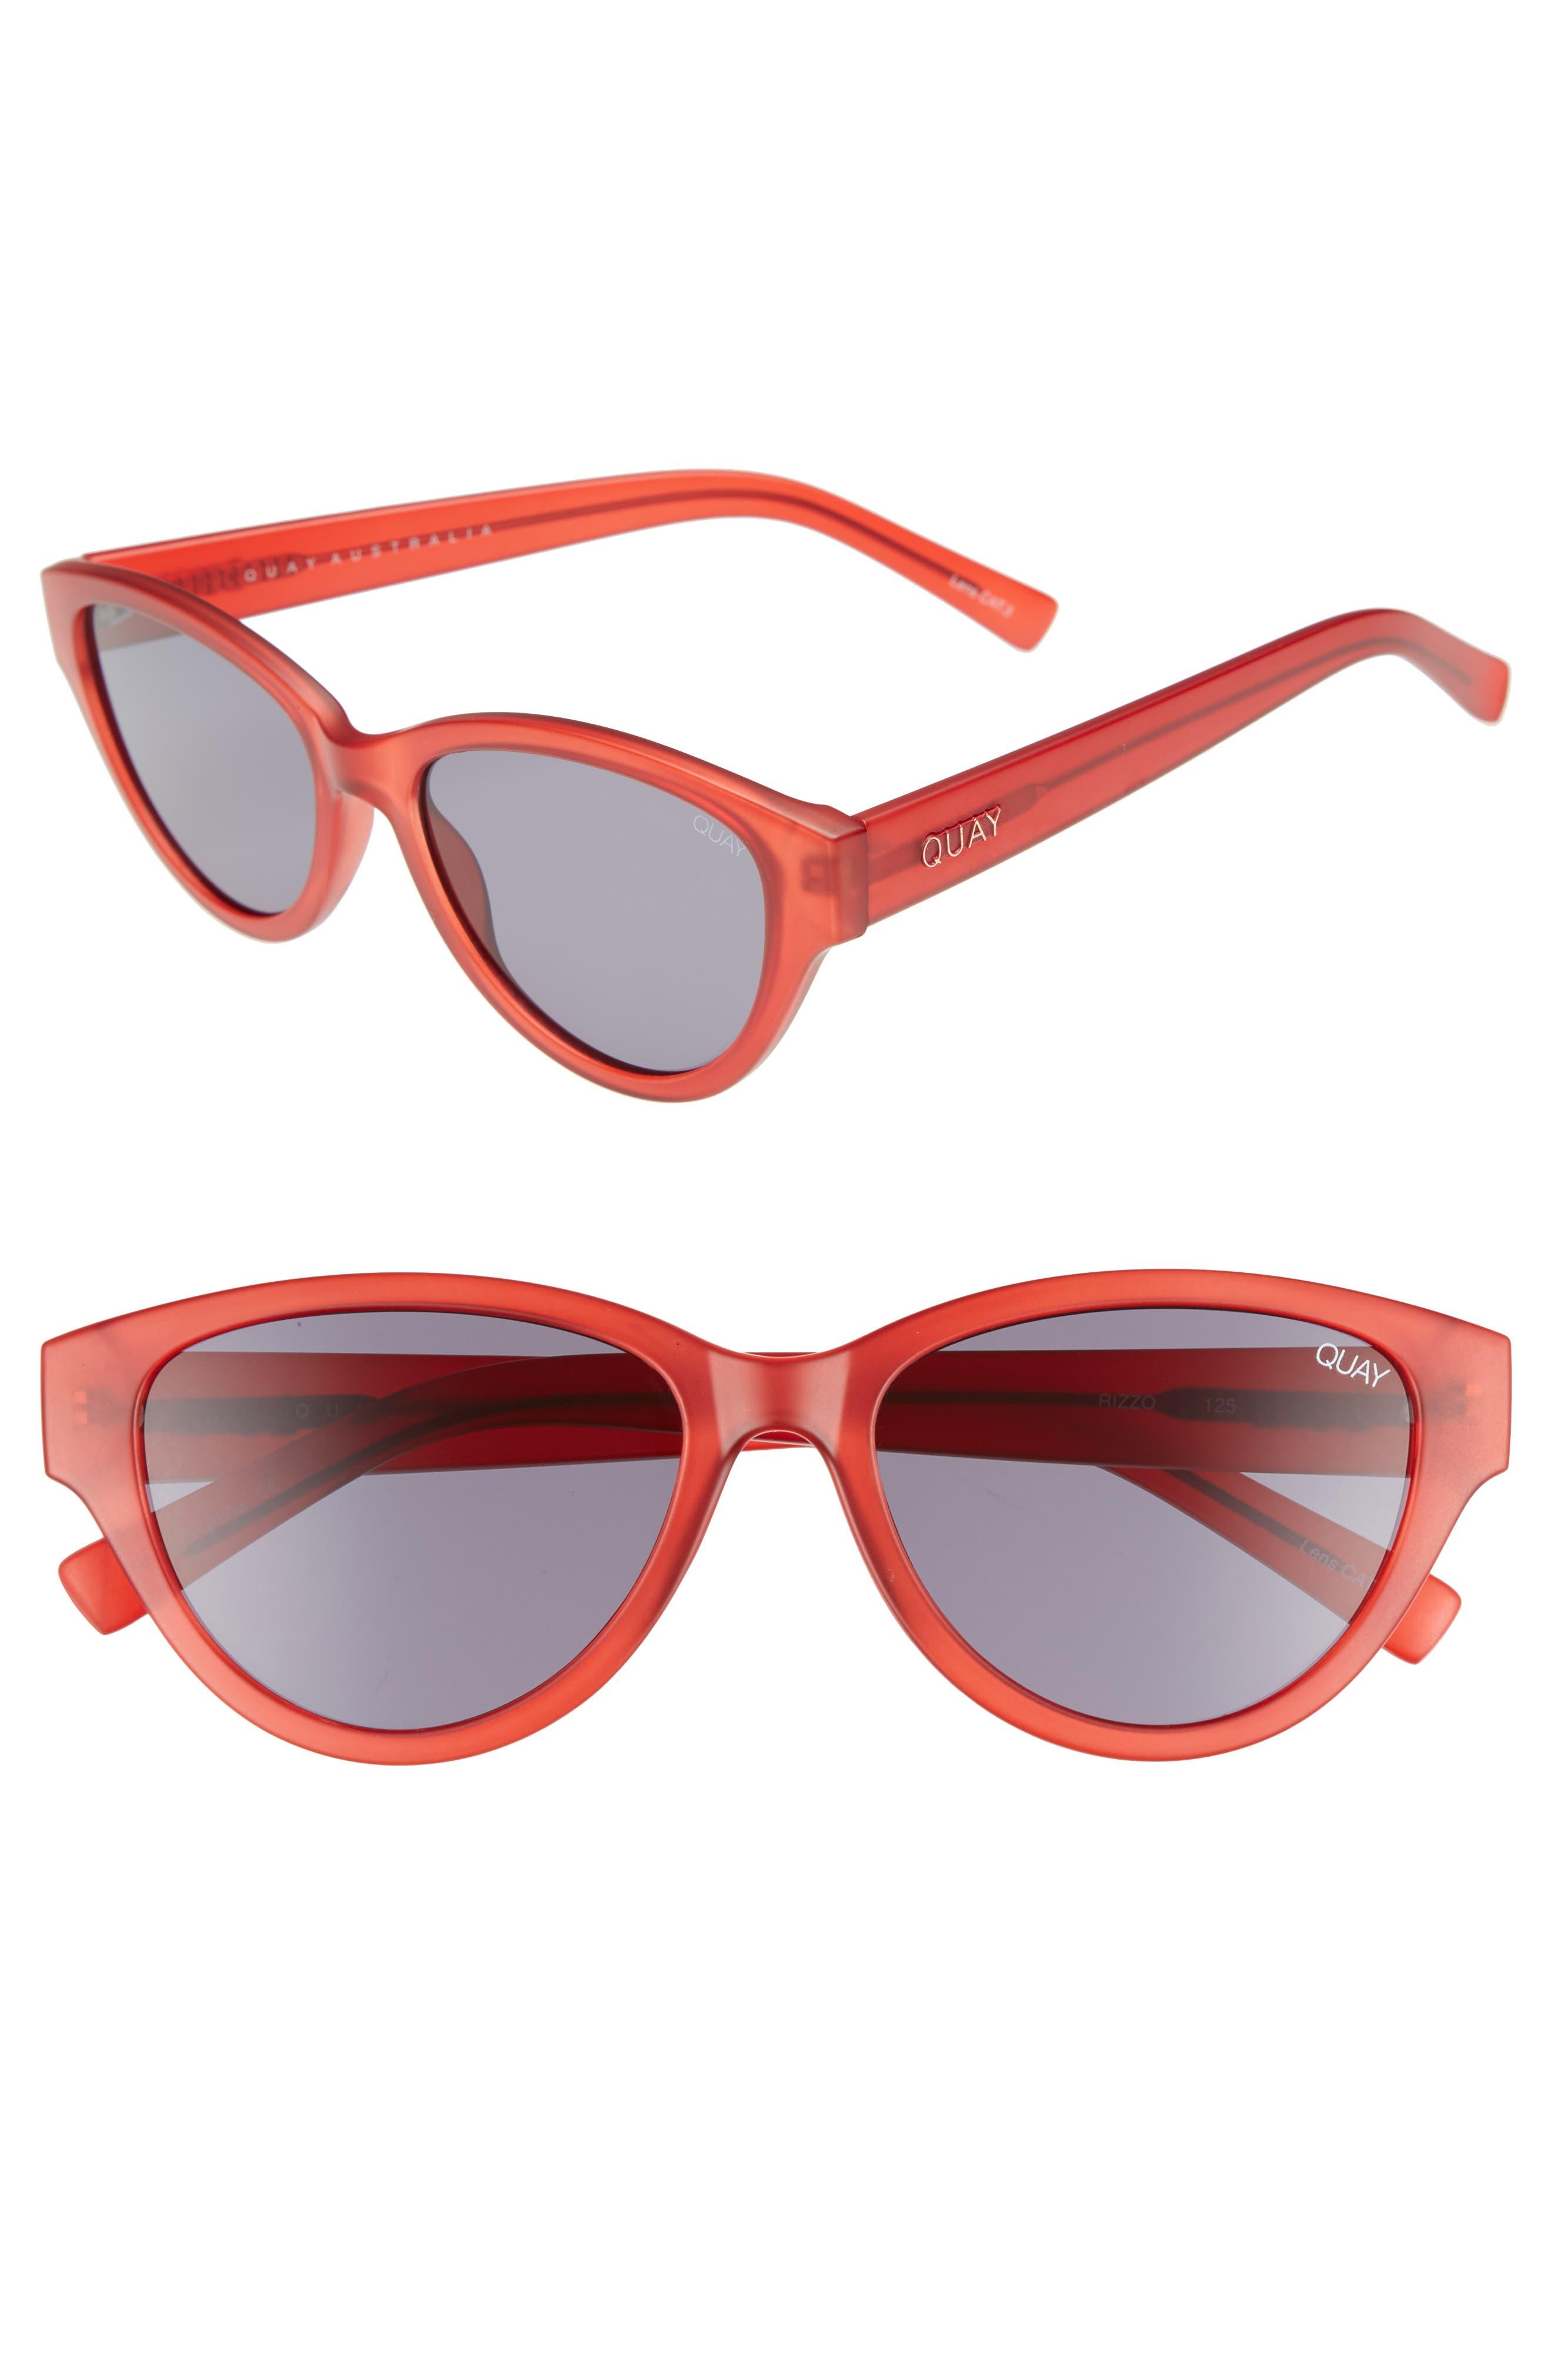 Quay Australia Rizzo 55Mm Cat Eye Sunglasses - Red/ Smoke